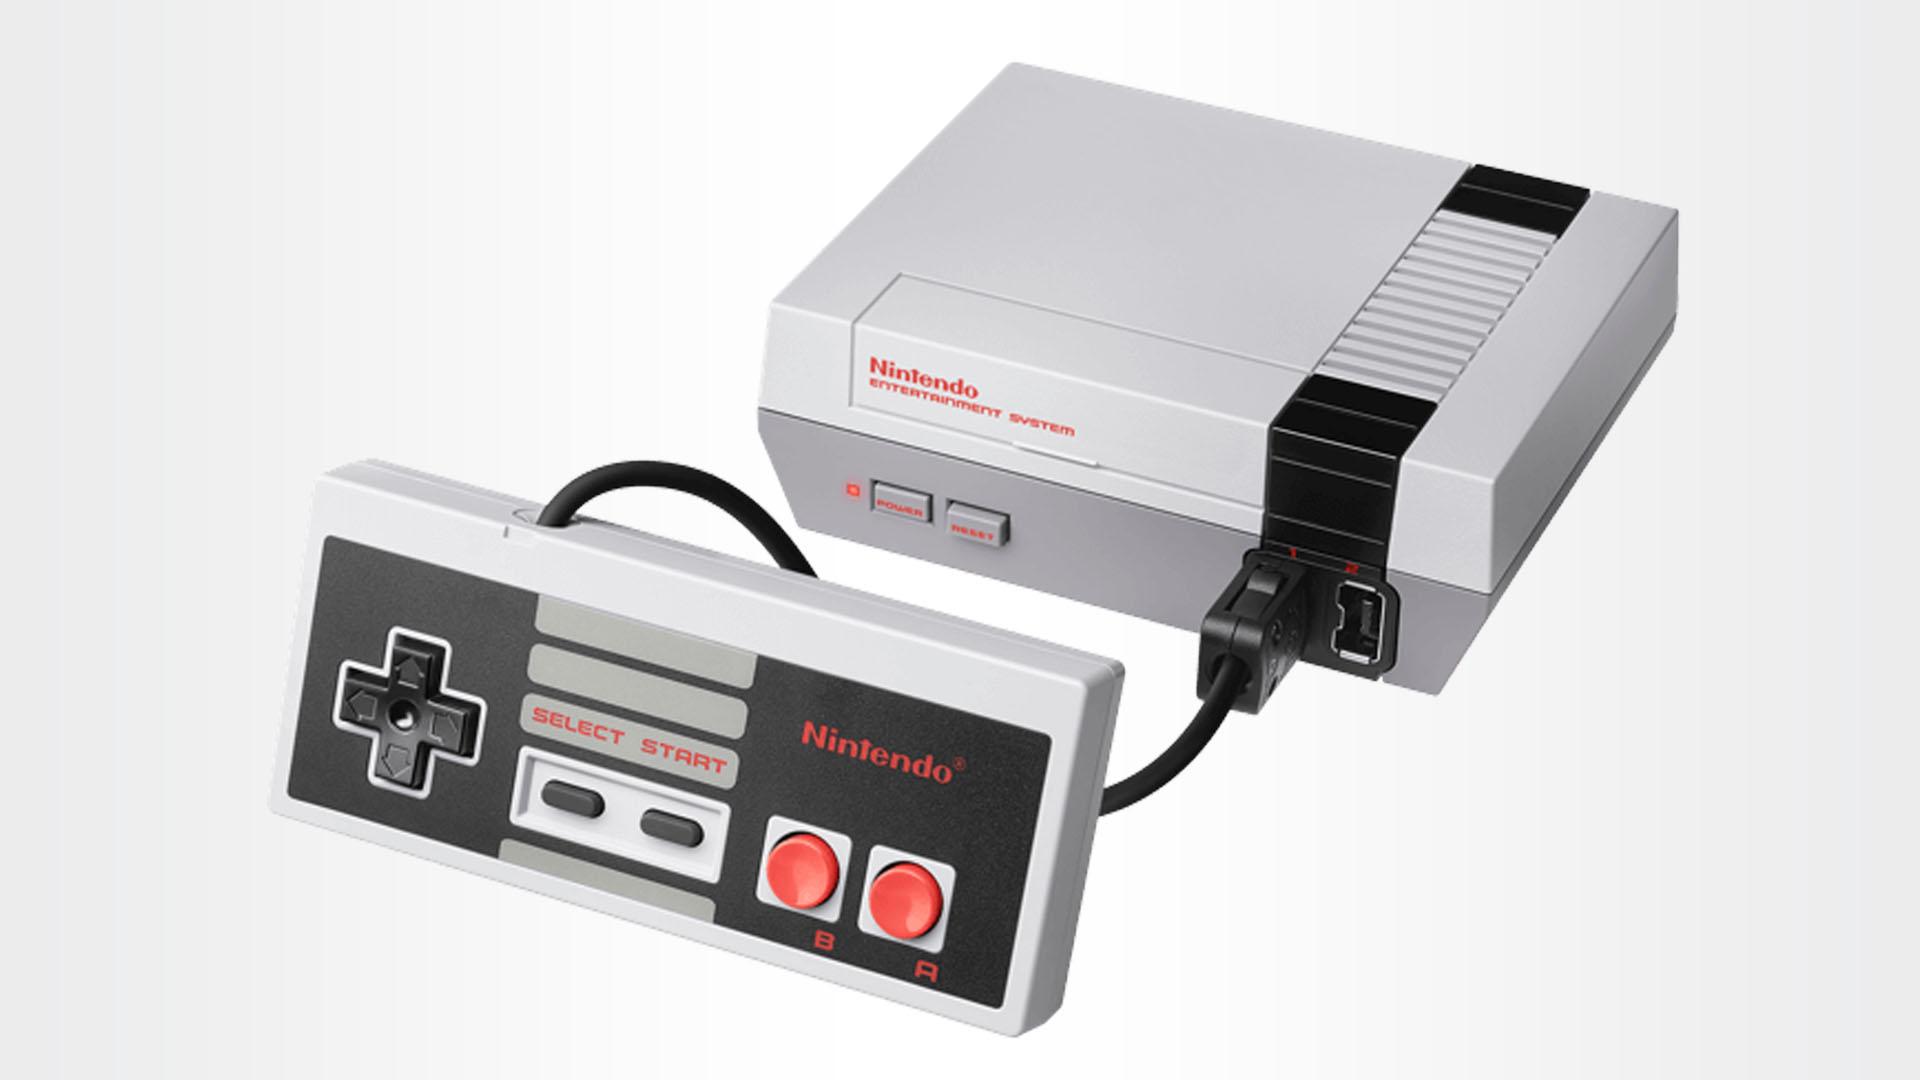 Nintendo Entertainment System - Classic Edition